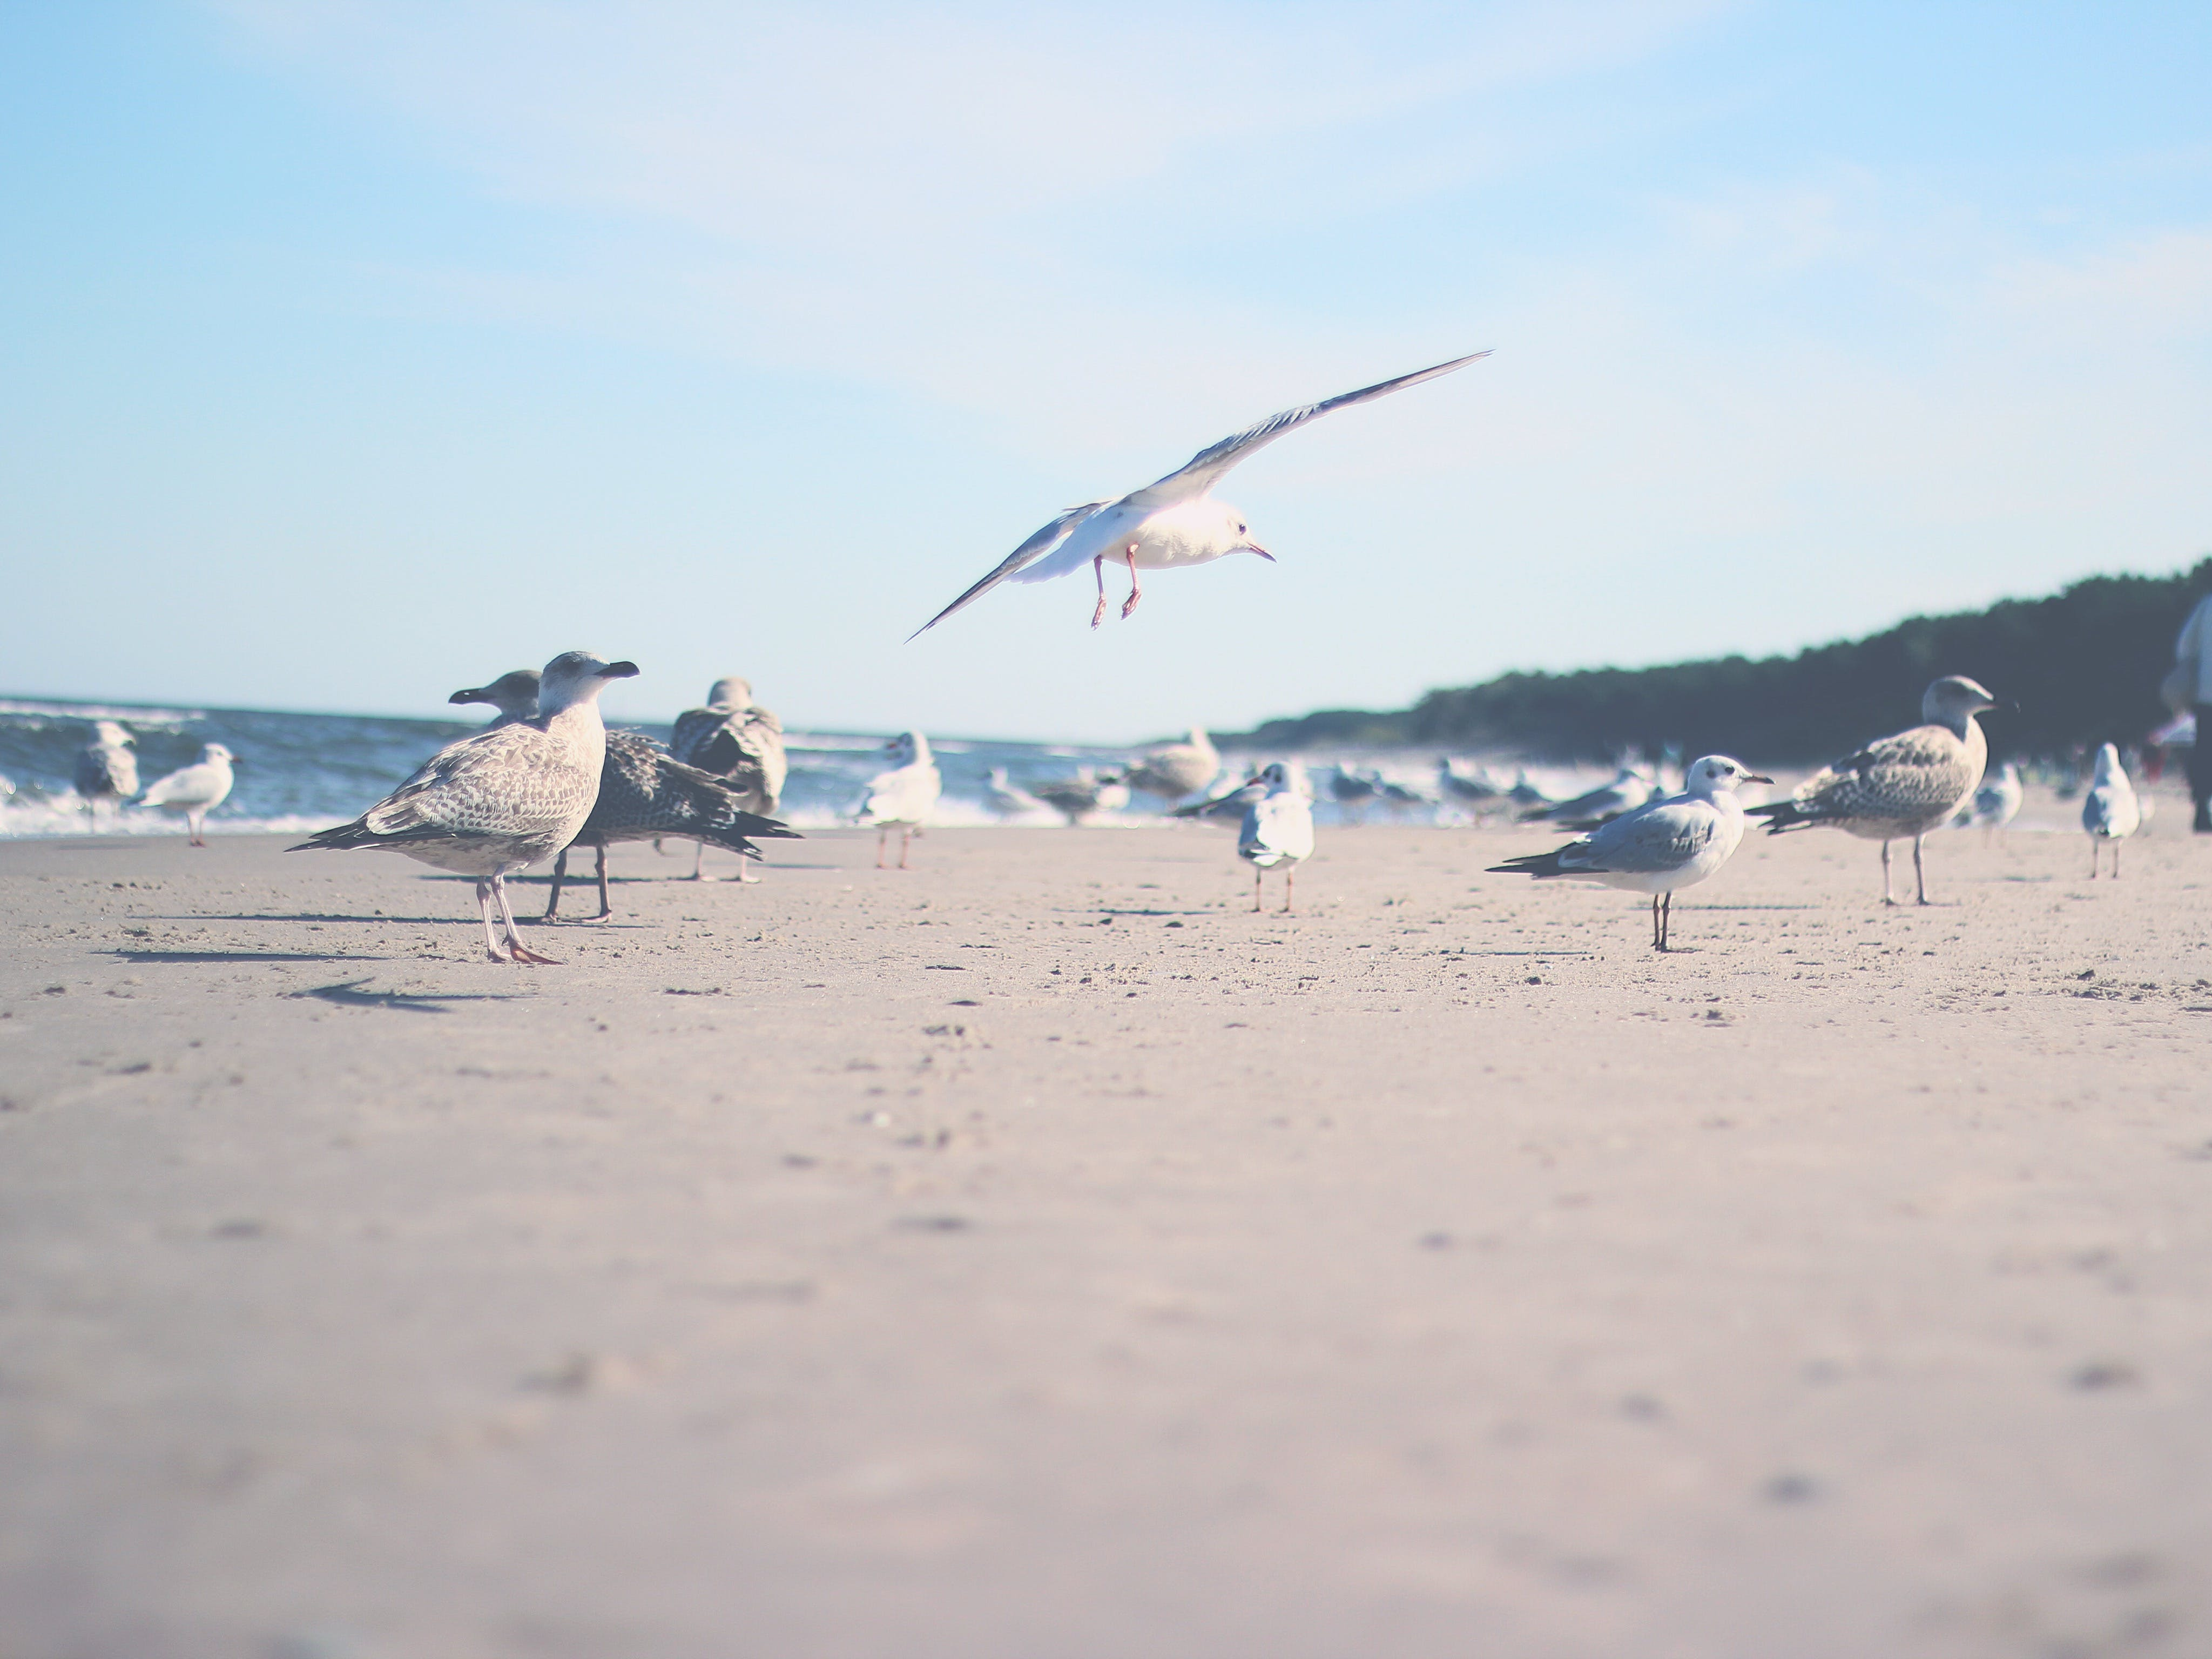 White Birds on Beach